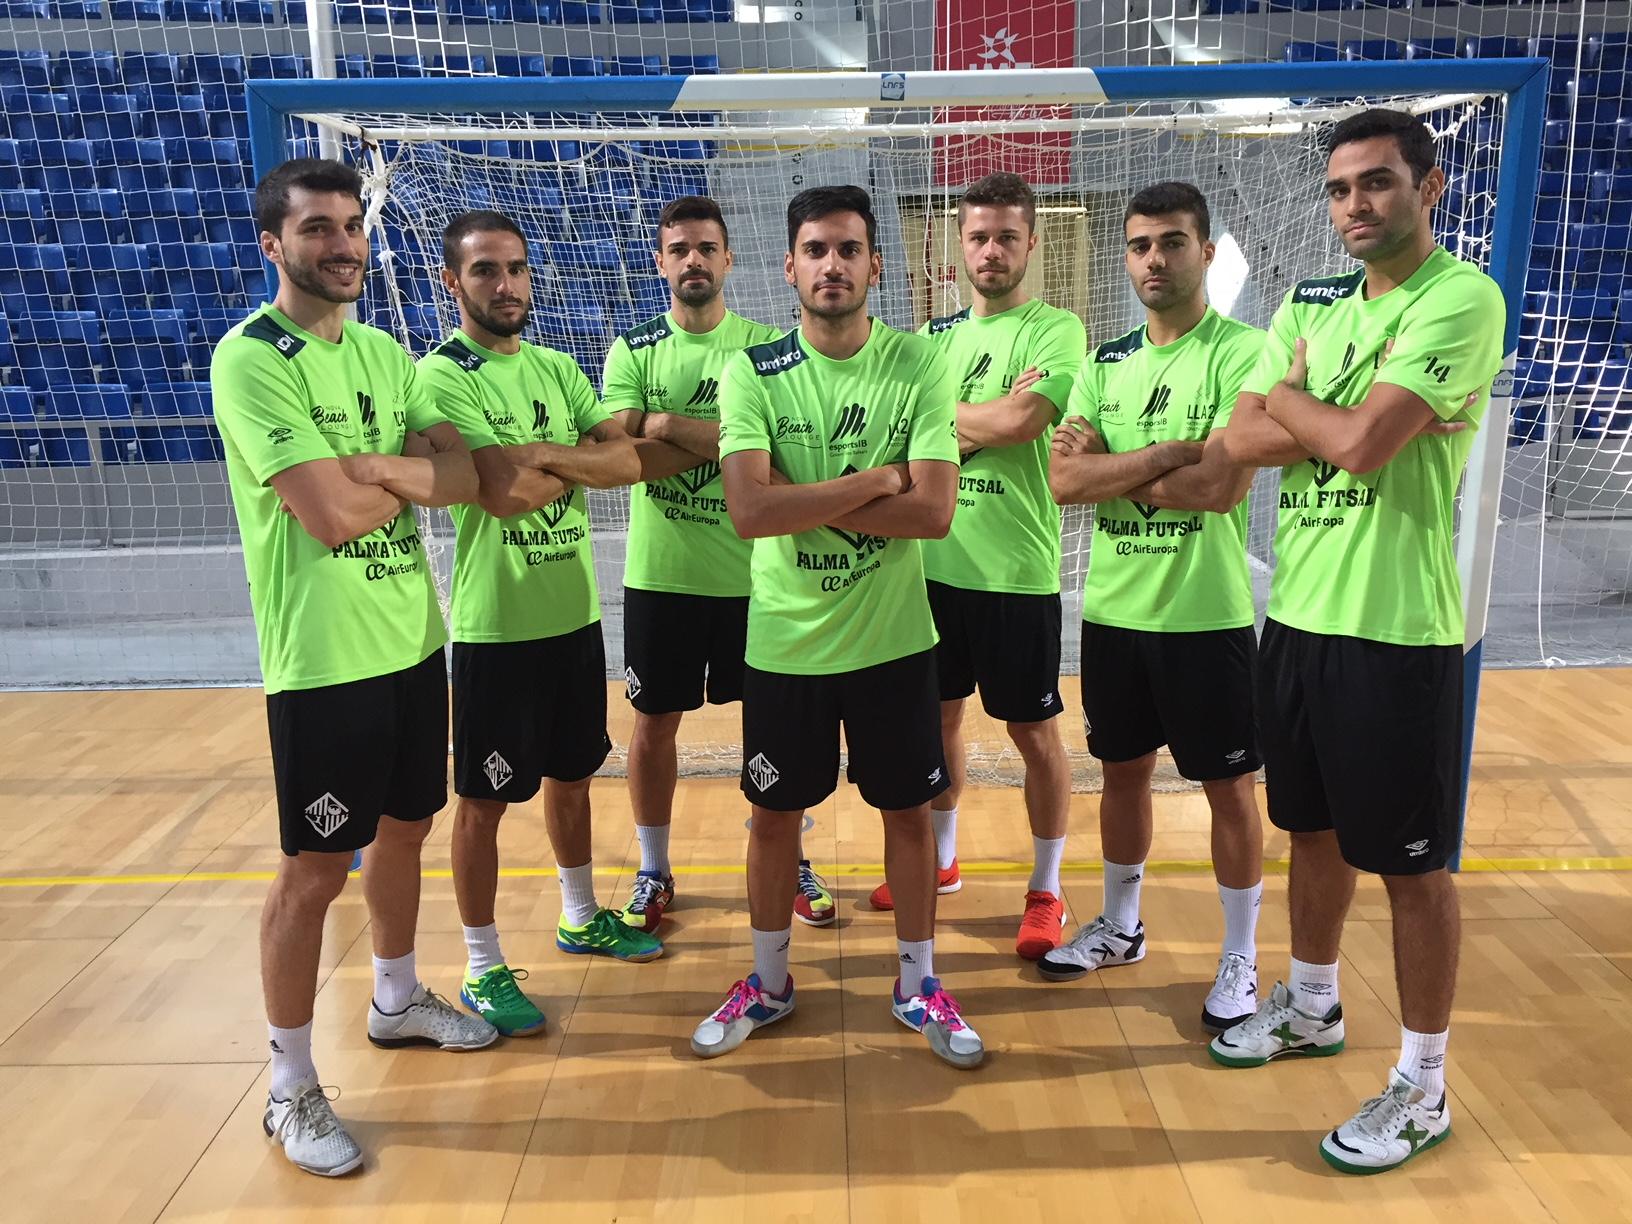 Varios jugadores del Palma Futsal posan en Son Moix 1